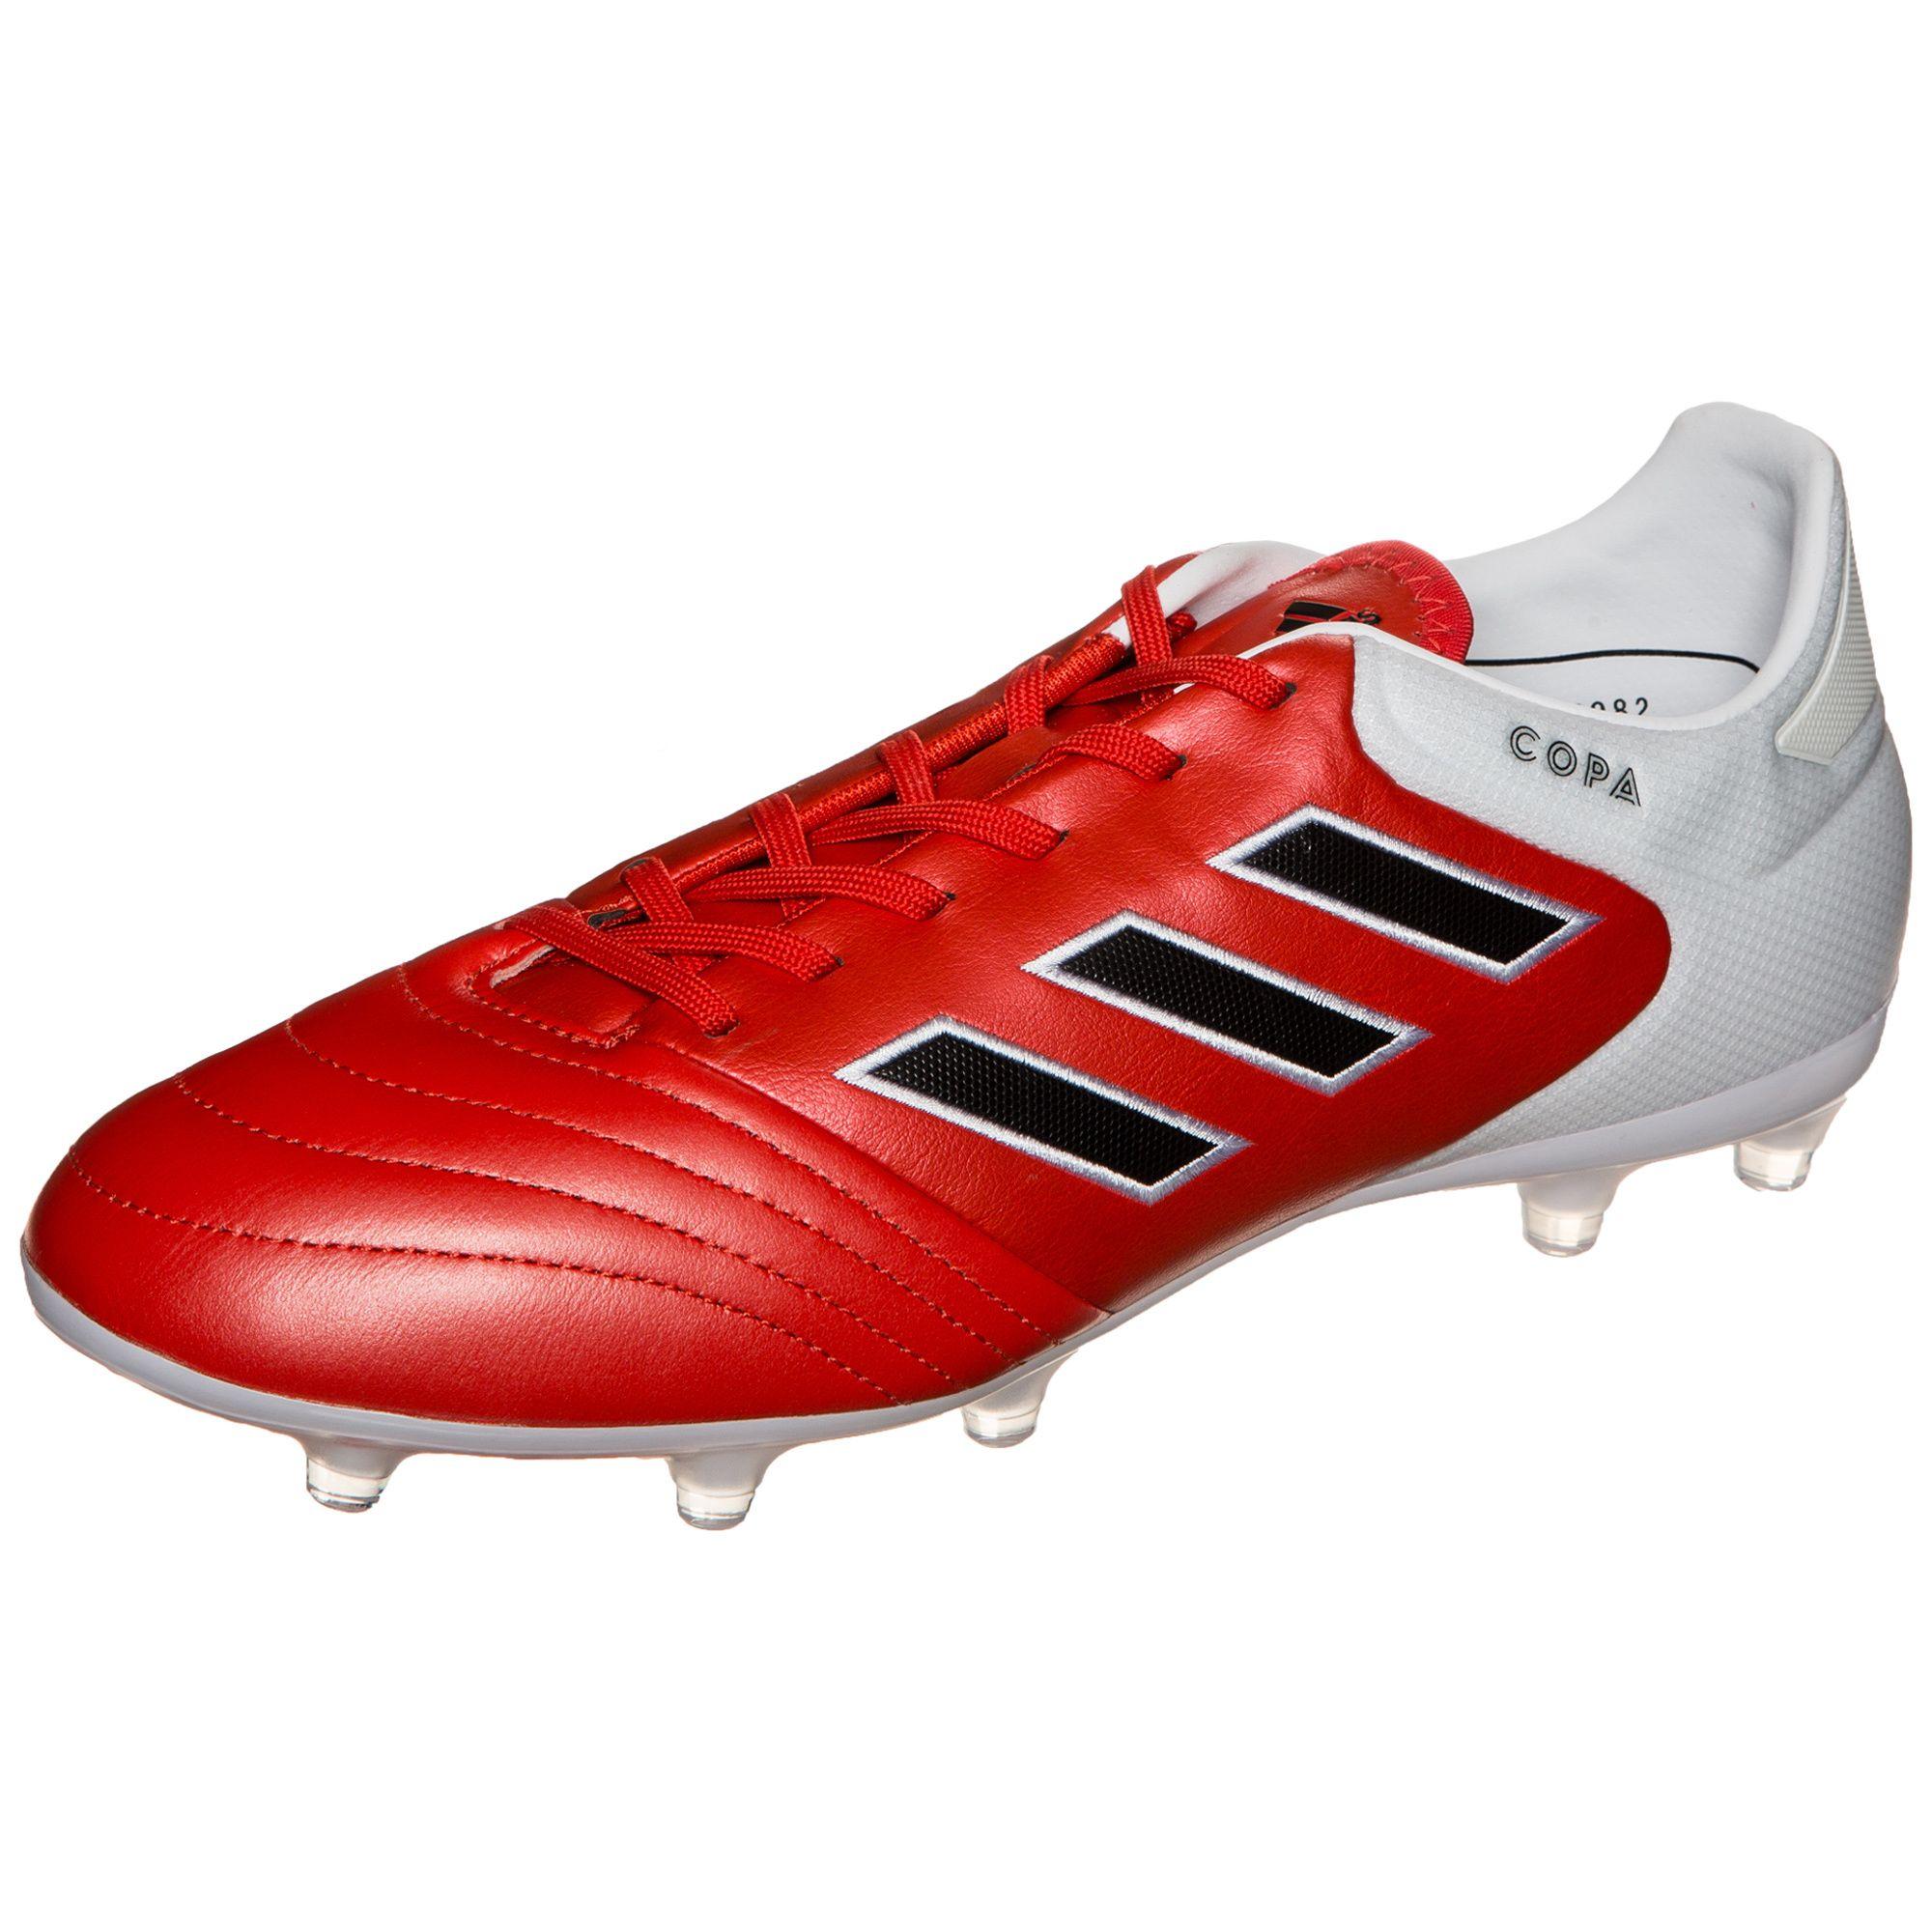 ADIDAS PERFORMANCE adidas Performance Copa 17.2 FG Fußballschuh Herren